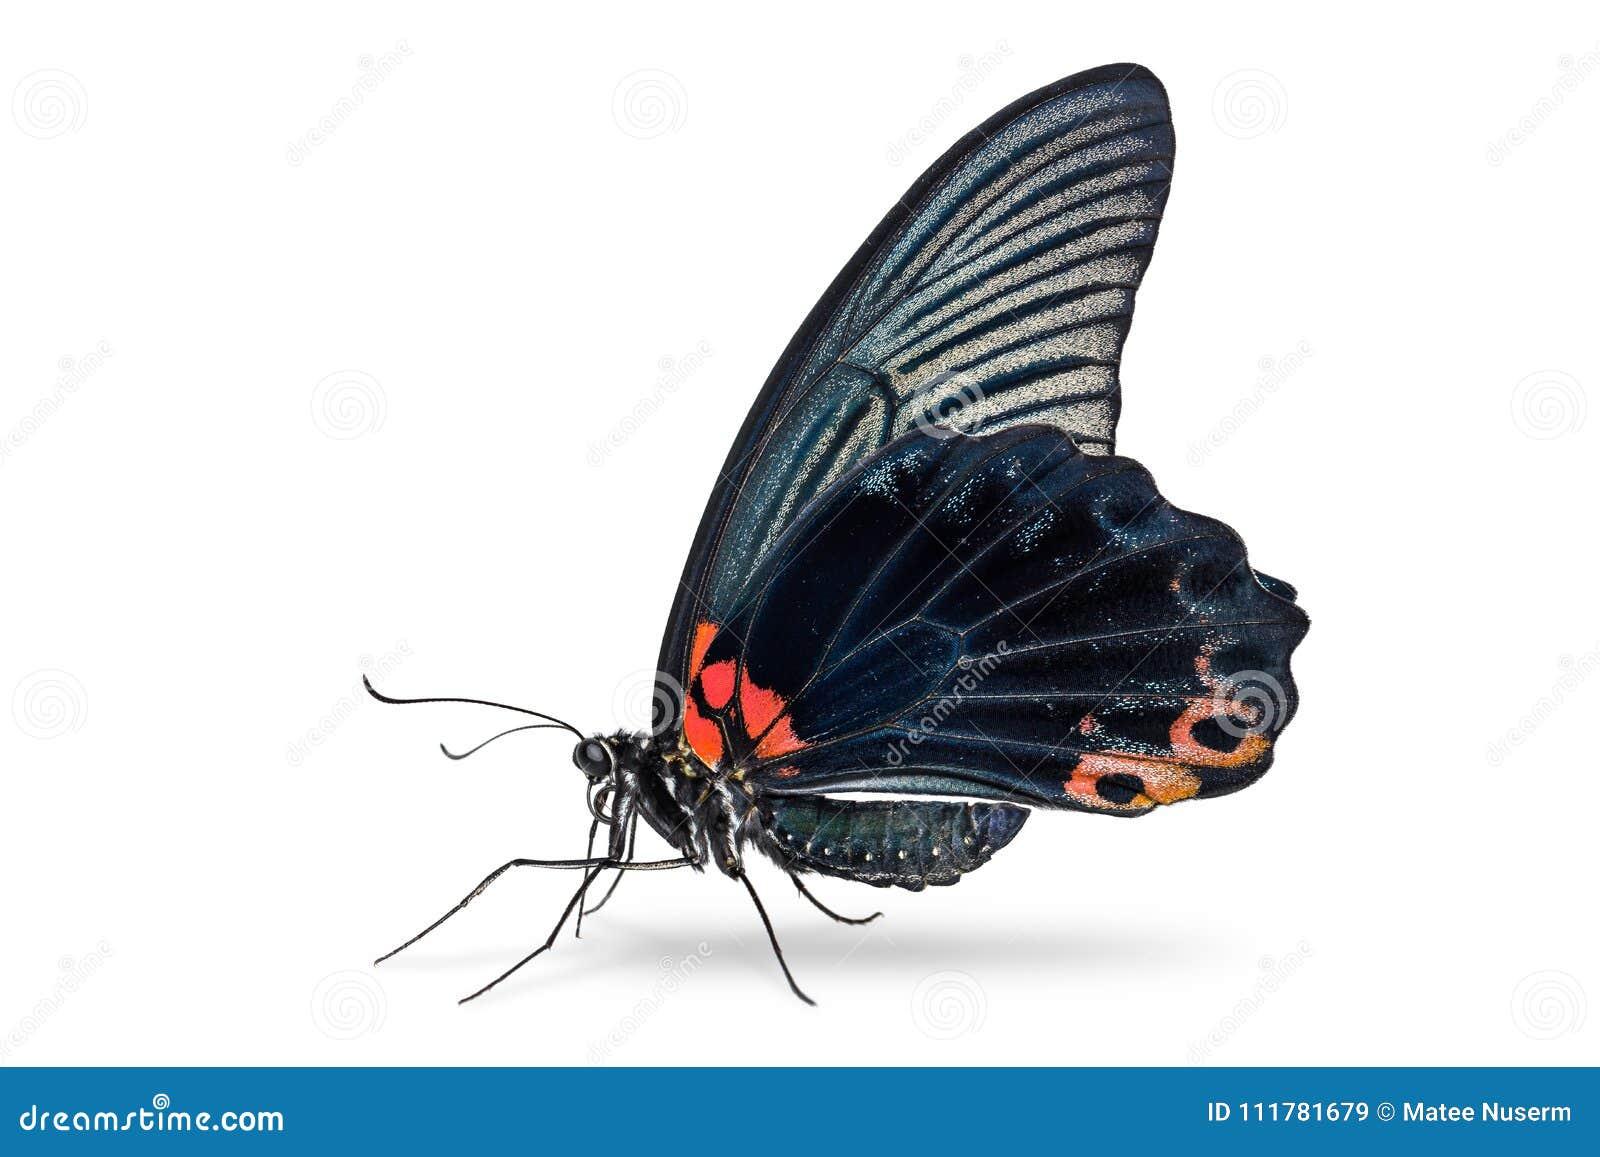 Male Great Mormon Papilio memnon butterfly